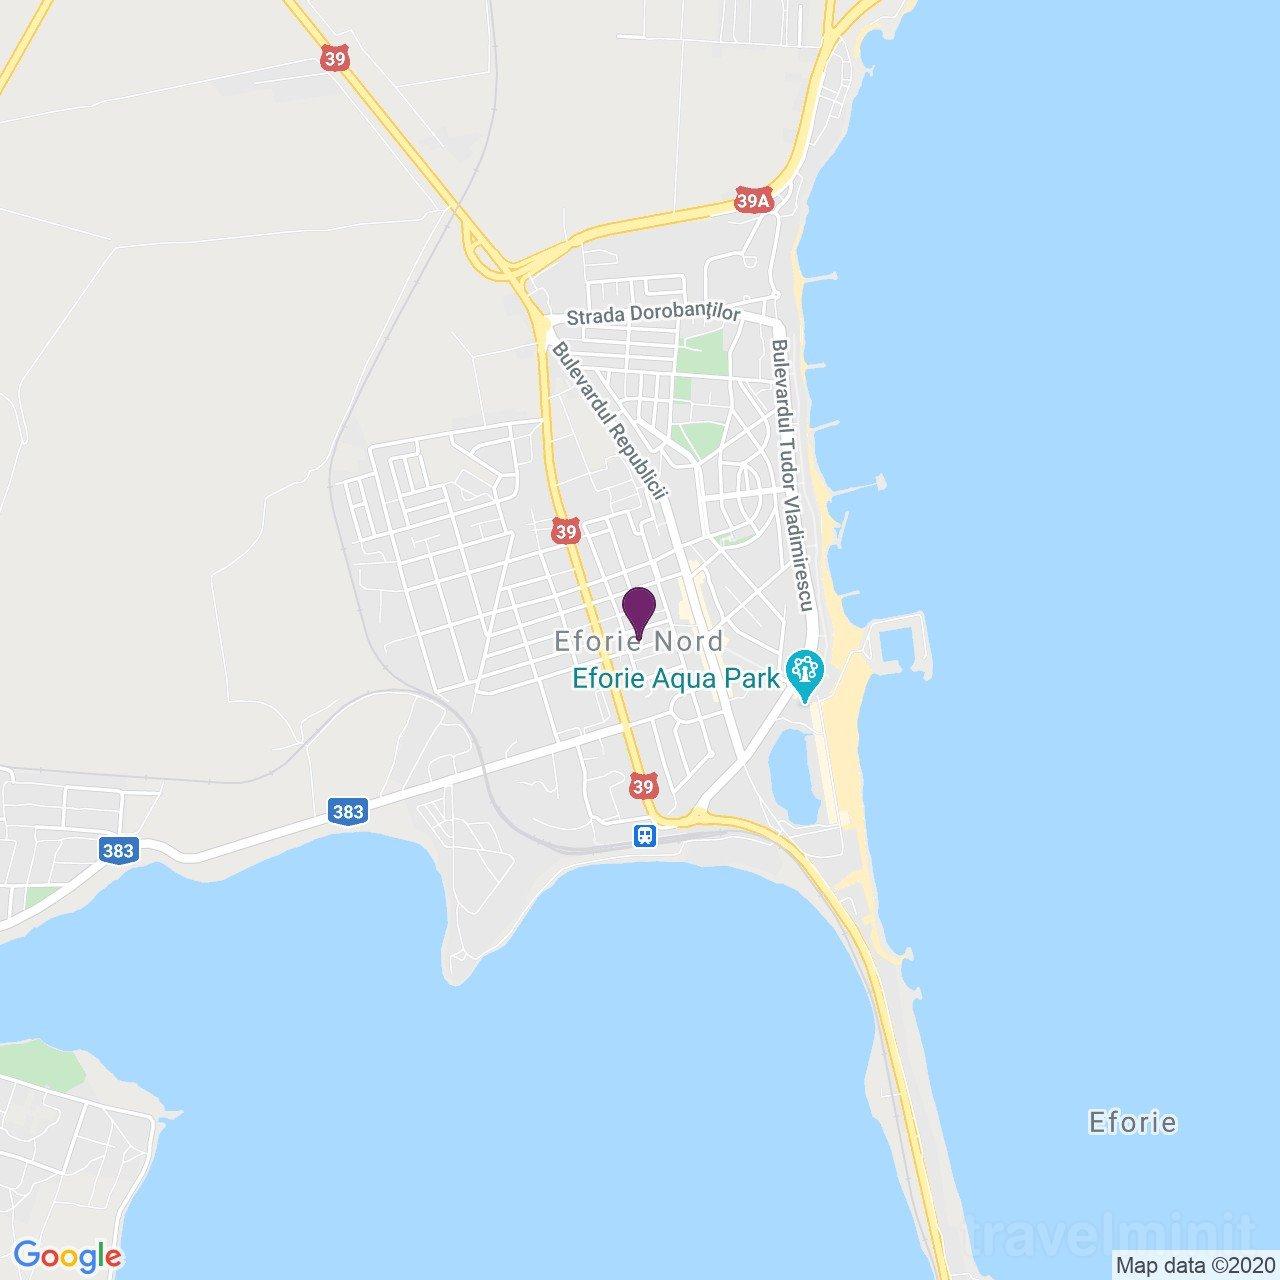 MariSol Vila Eforie Nord